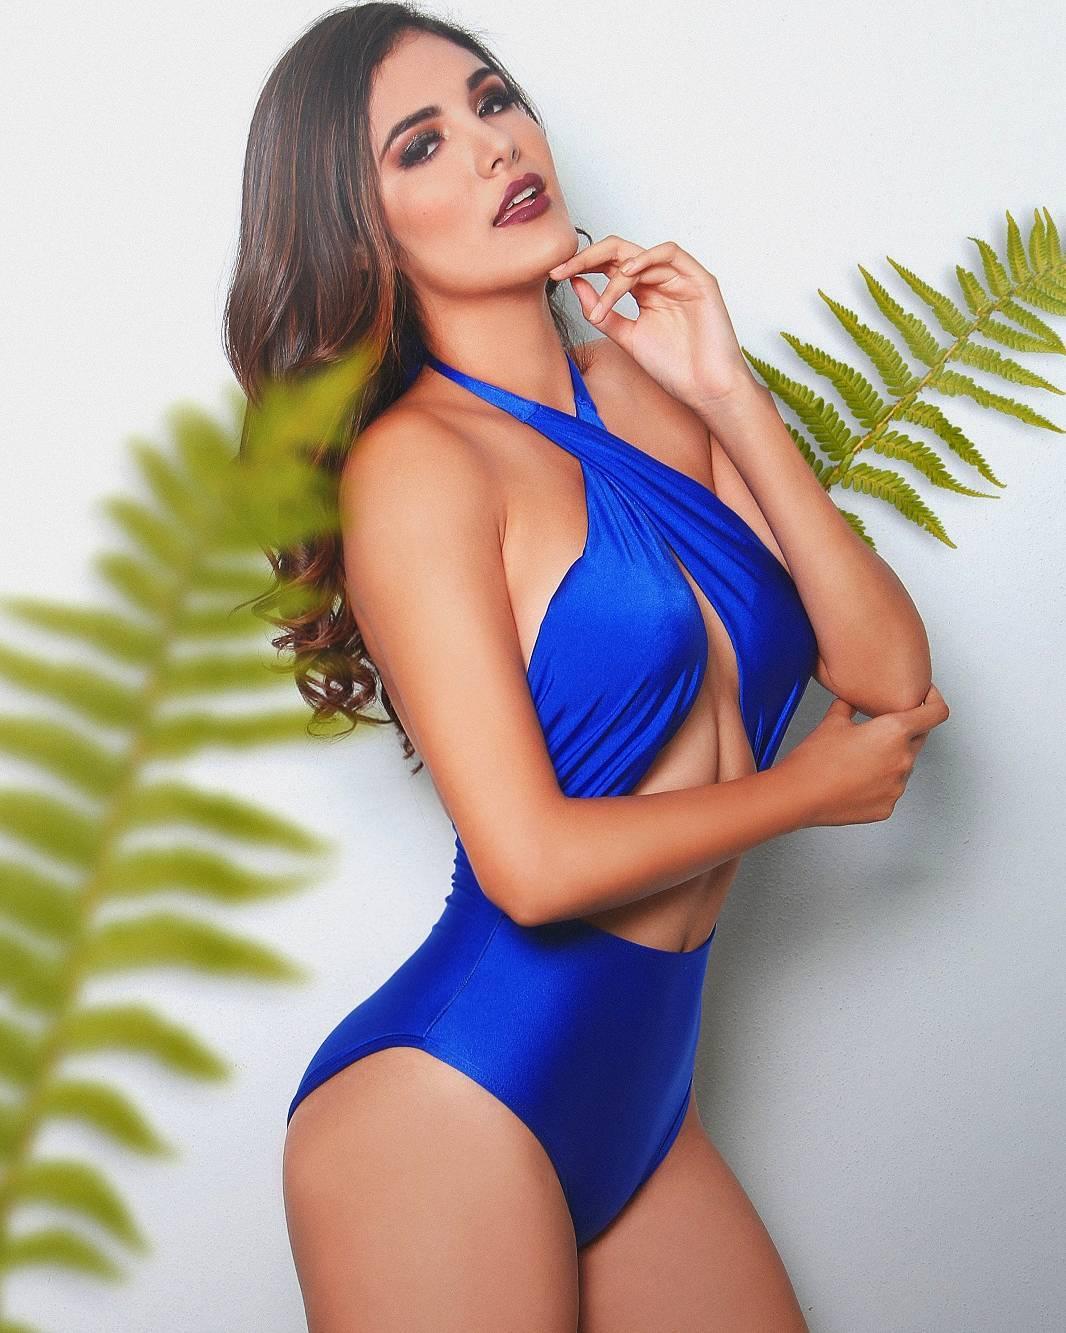 phegda bustillos, miss mexico para reinado inernacional cafe 2018. 6d9yr4rn